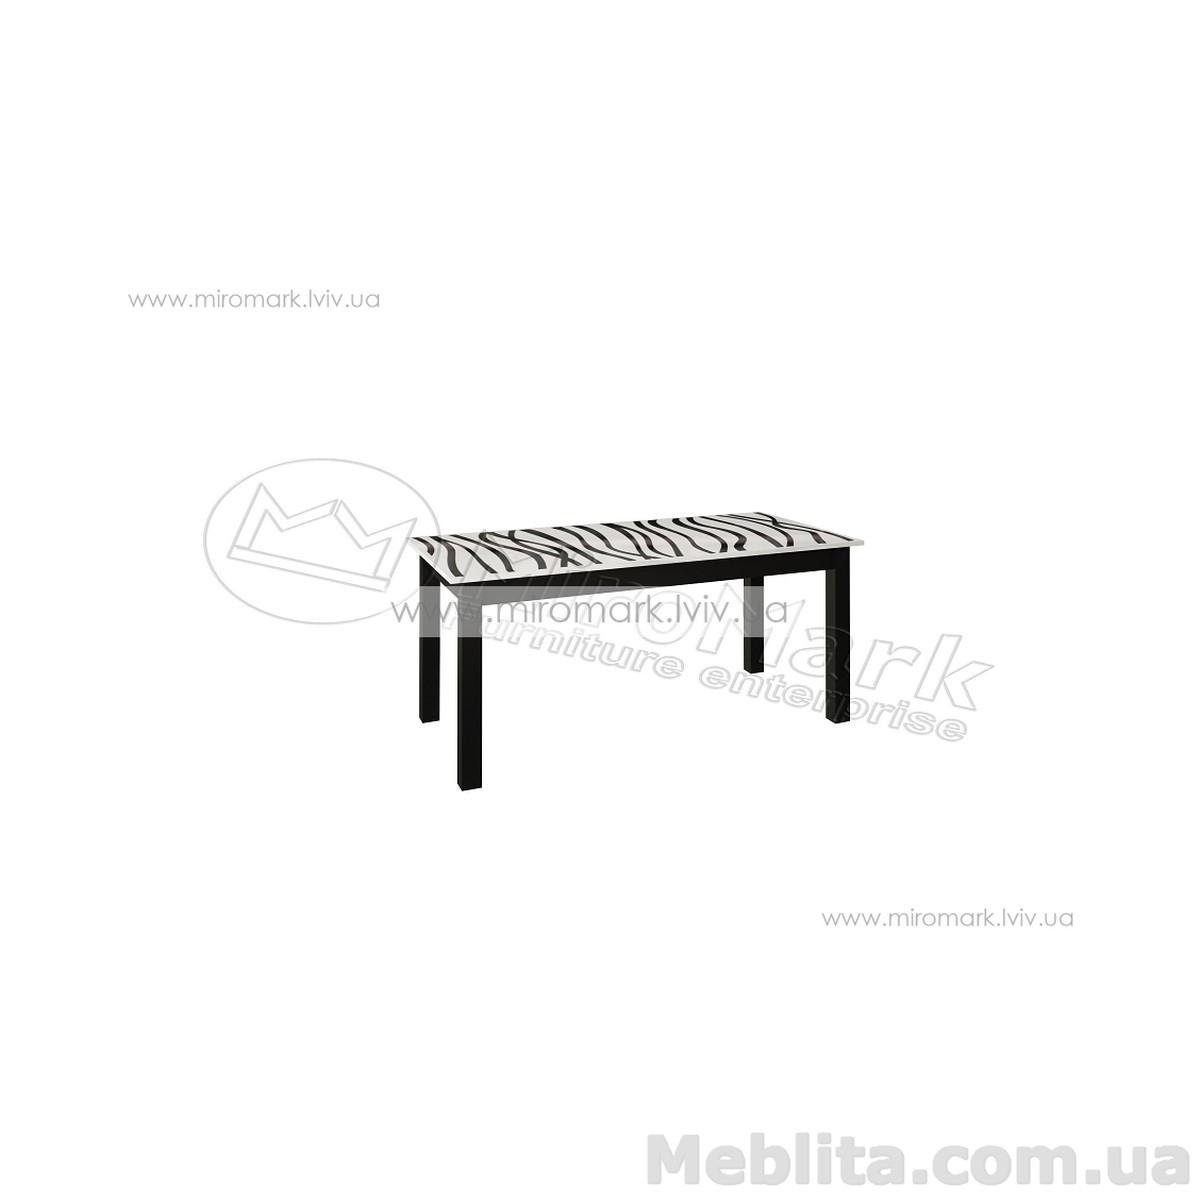 Терра стол столовый 120*60